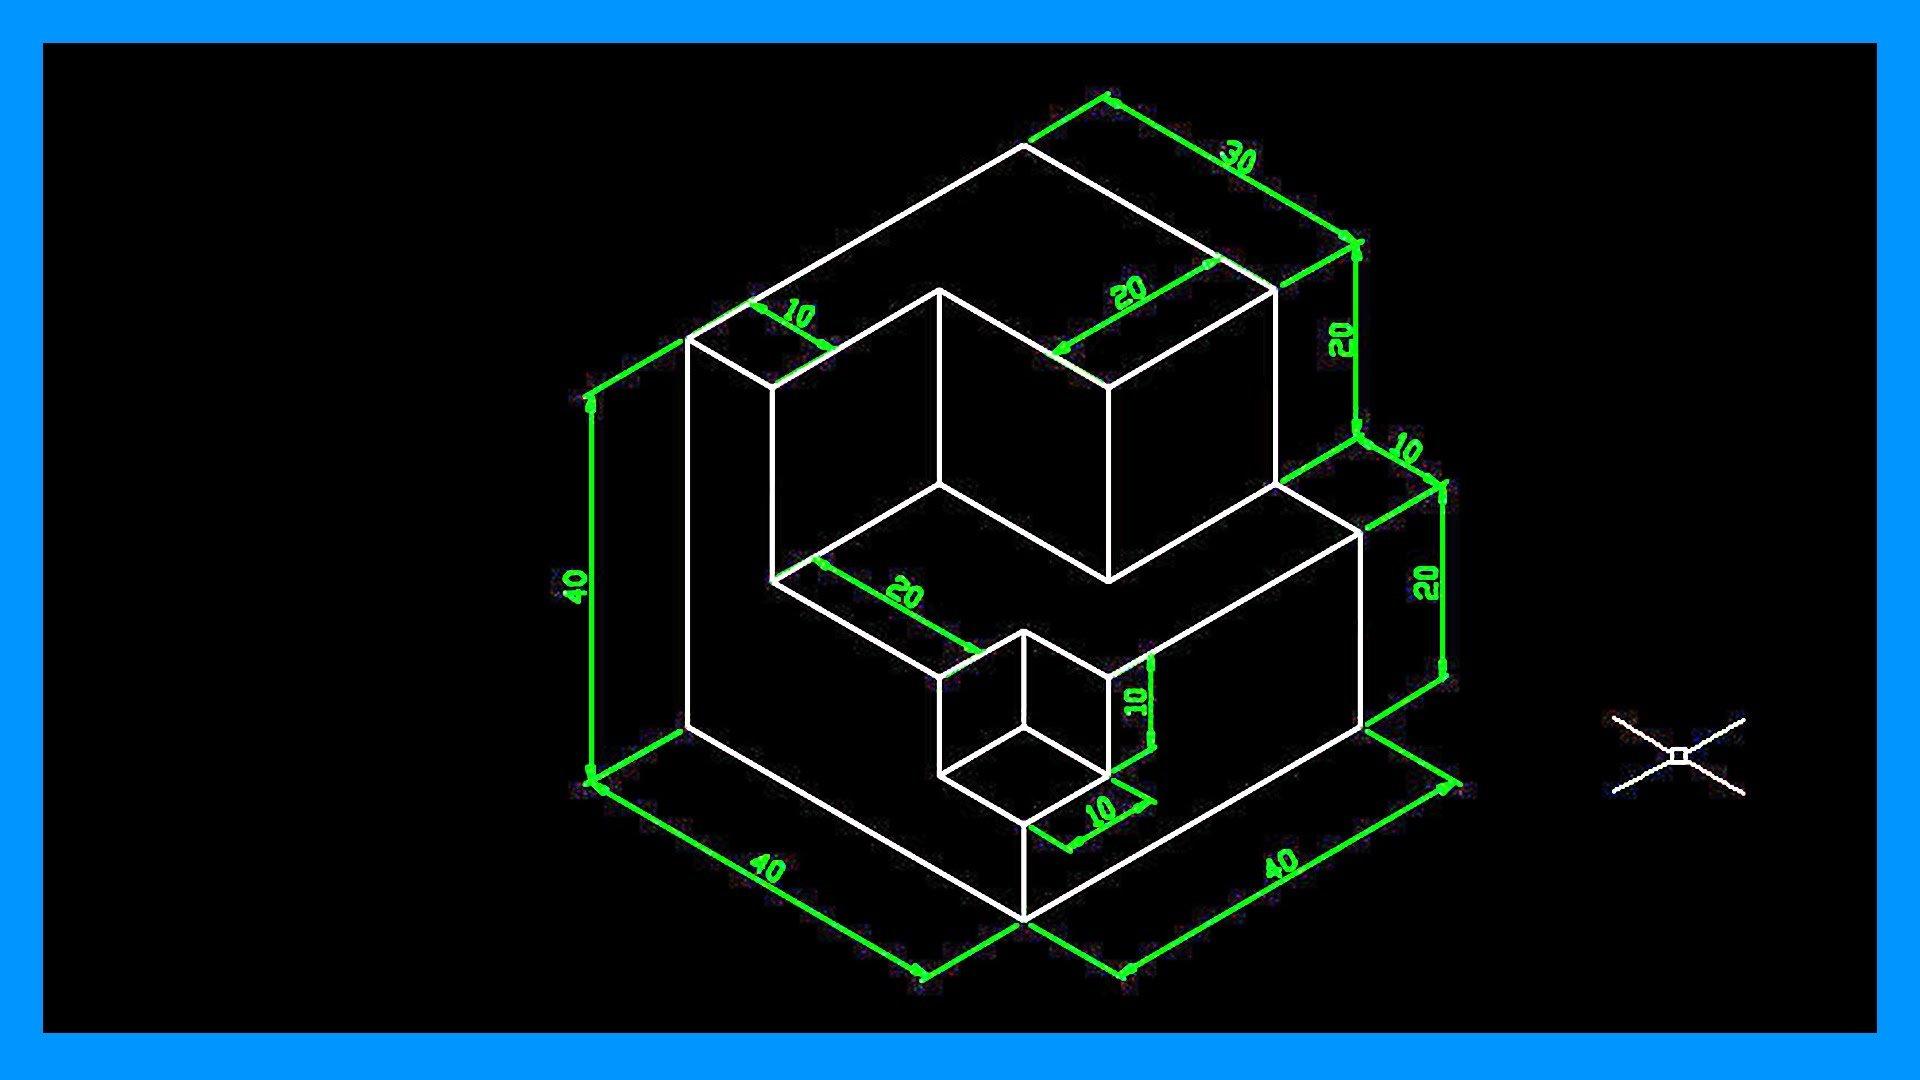 Autocad – Dibujar en isométrico. Crear dibujo isométrico en Autocad.